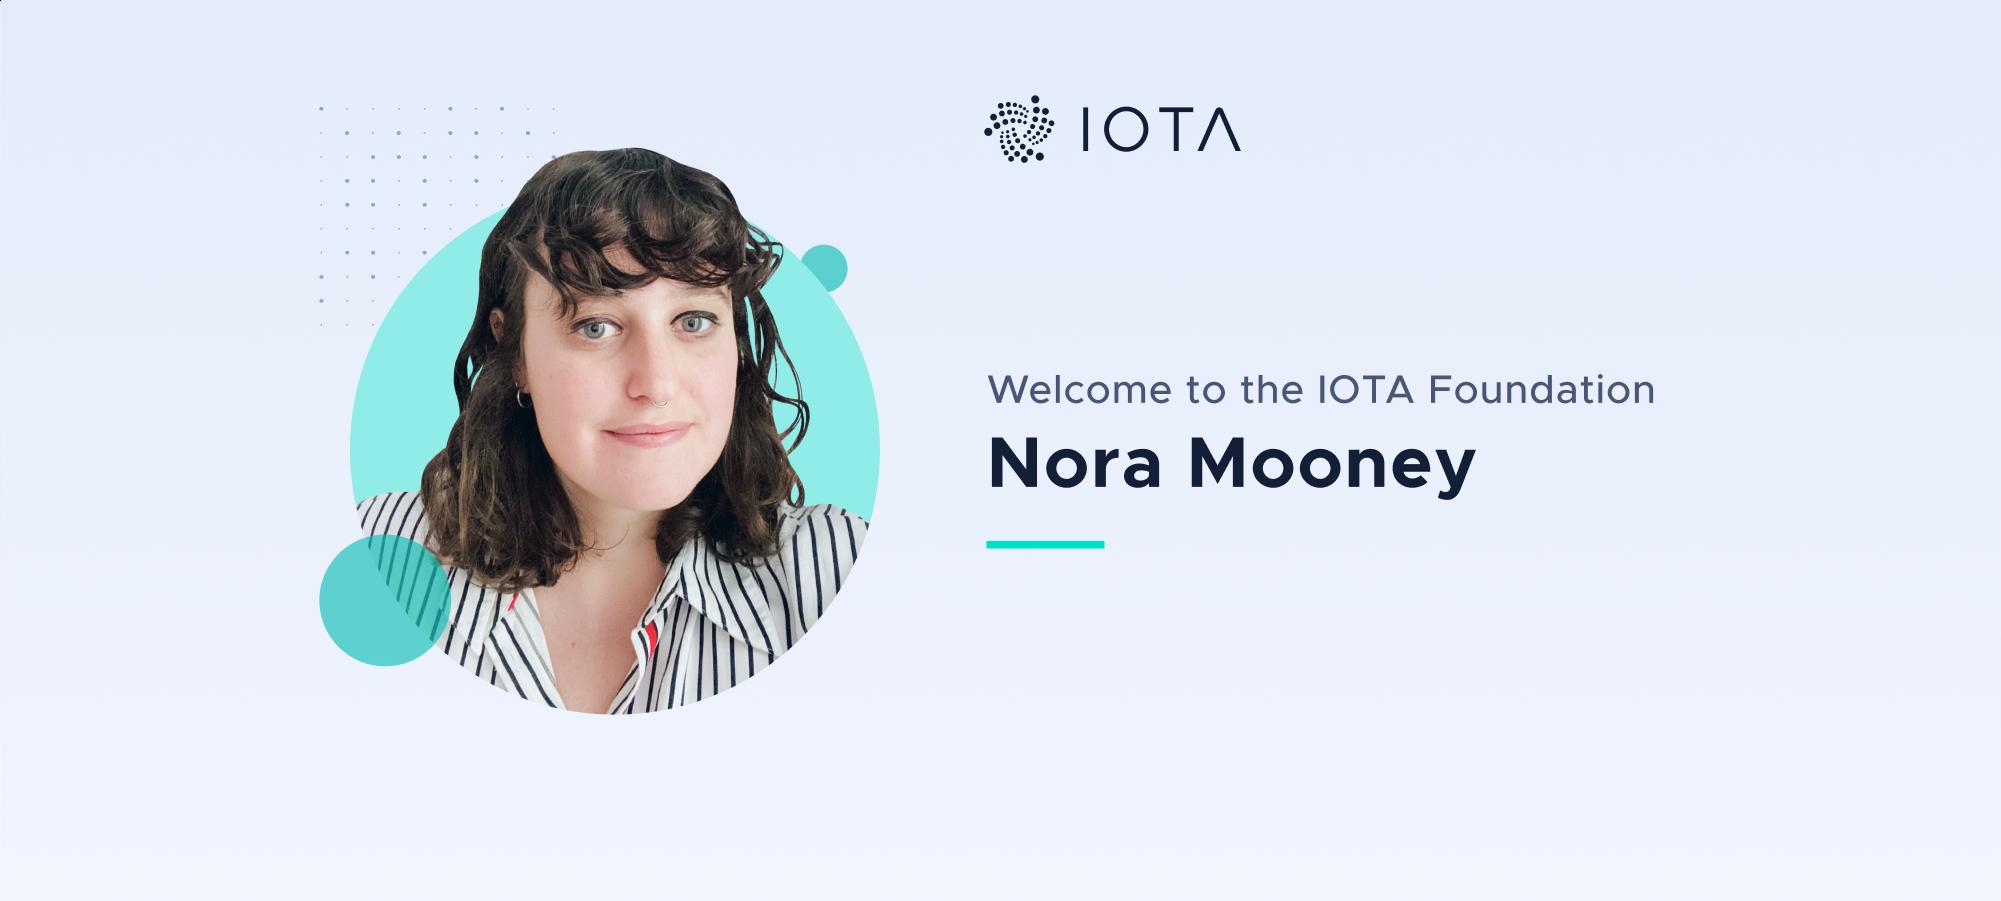 Welcome Nora Mooney to the IOTA Foundation